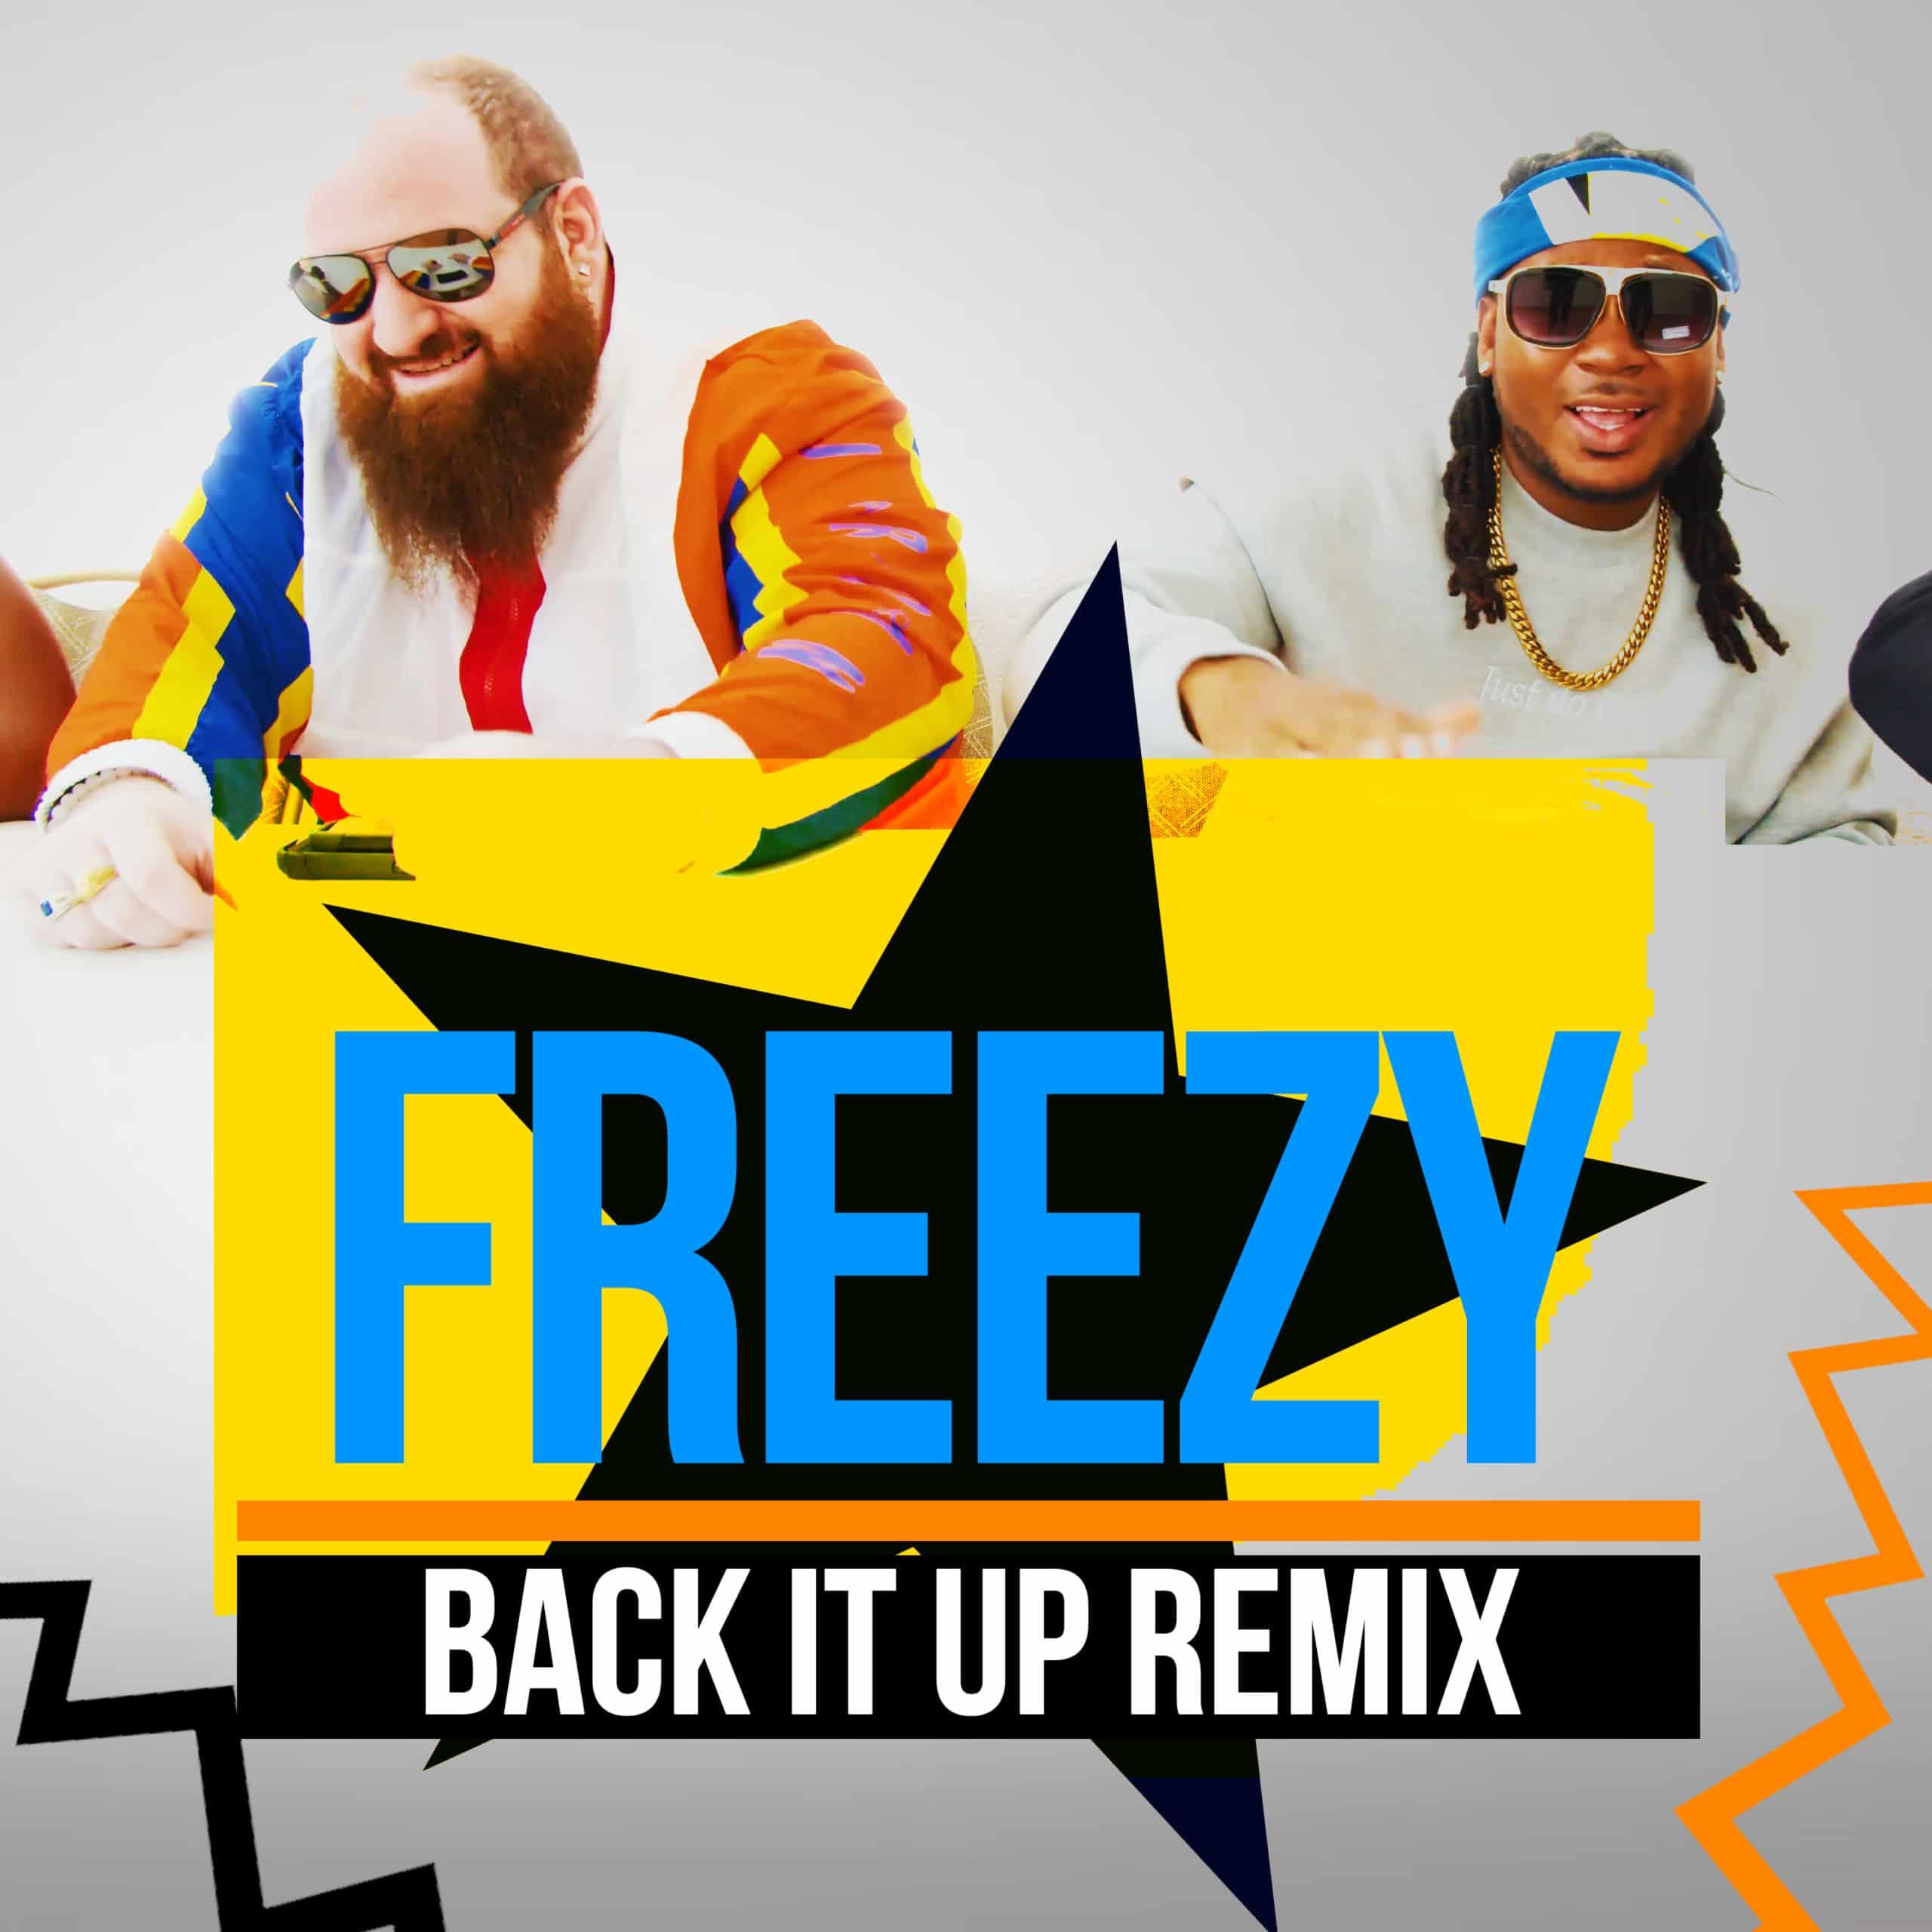 Freezy - Back It Up Remix feat King Bubba BASHMENT